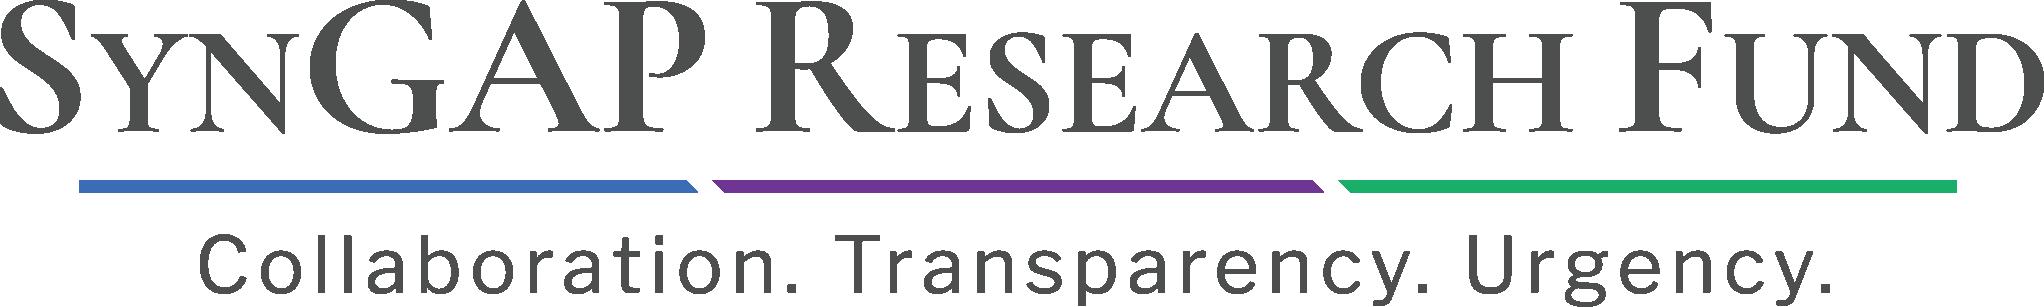 syngap-research-fund-logo_horizontal.png